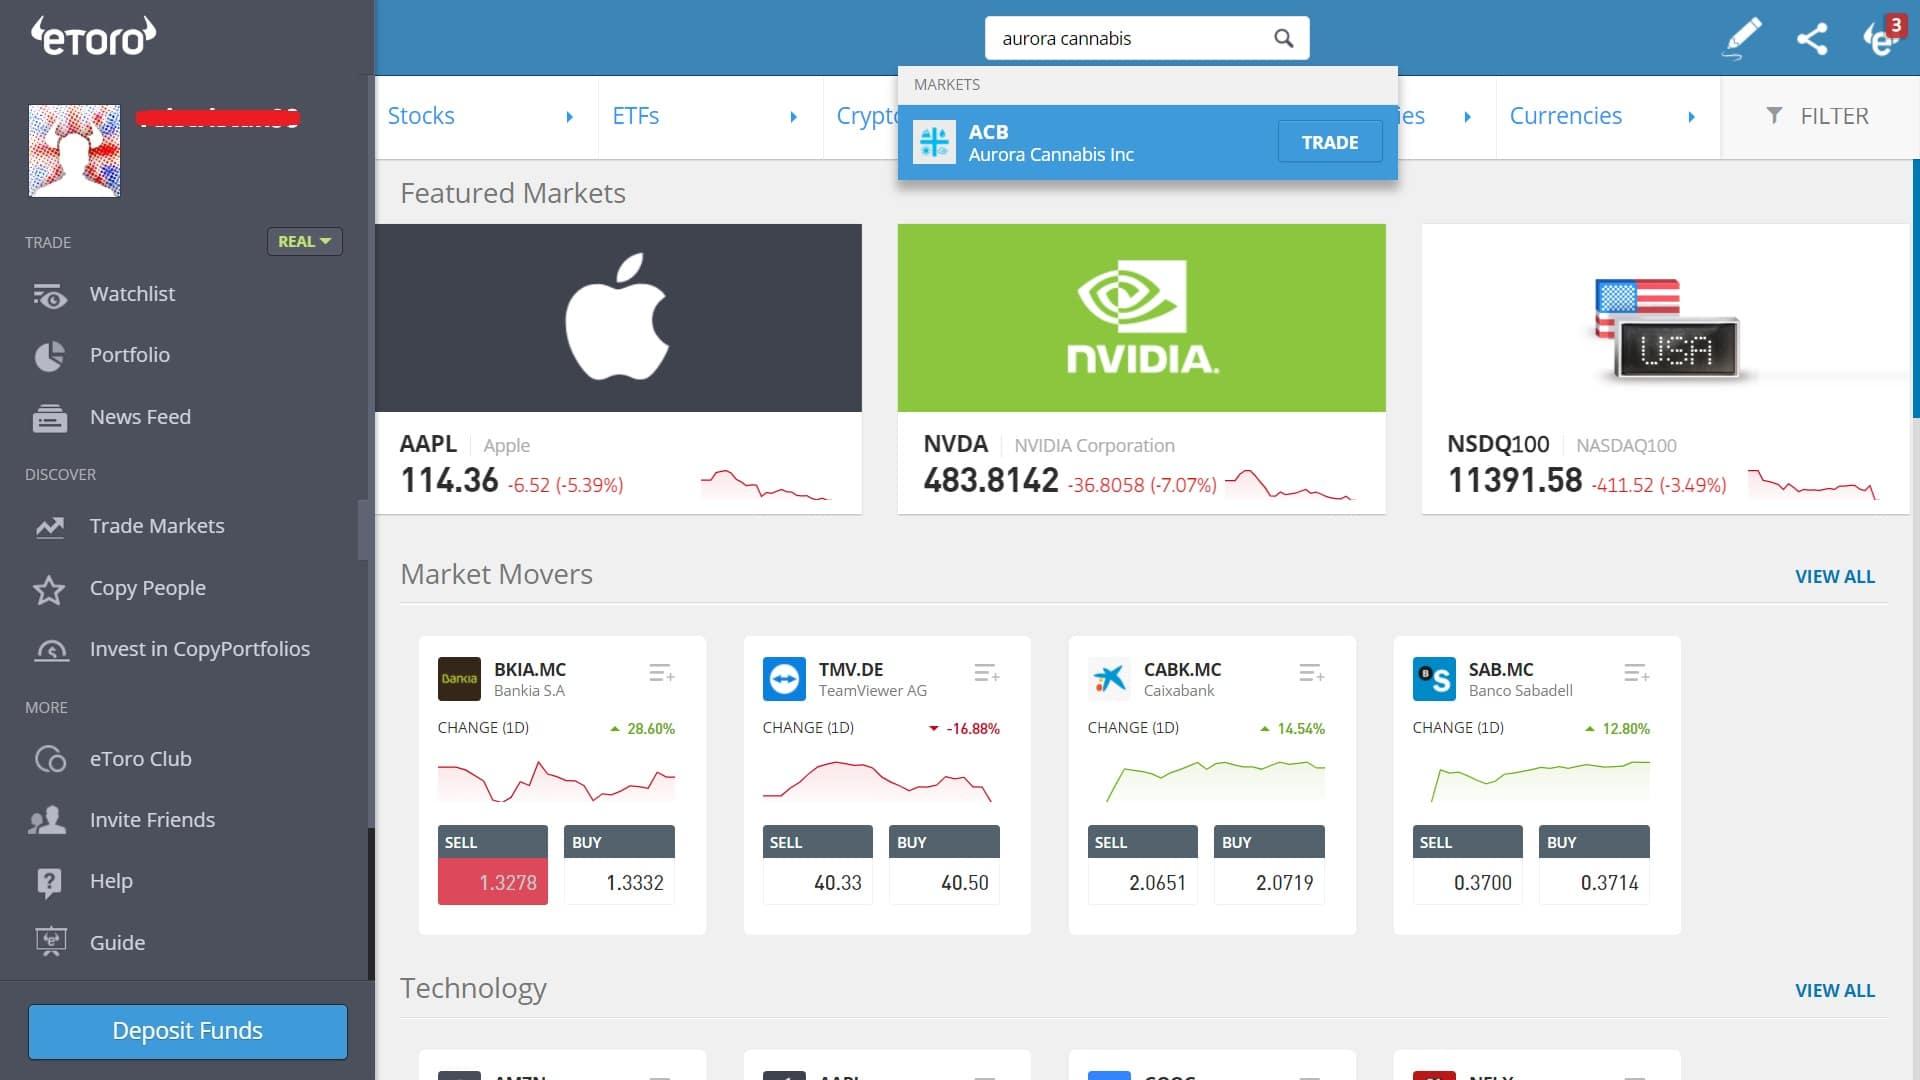 Searching for Aurora Cannabis stock on eToro's platform